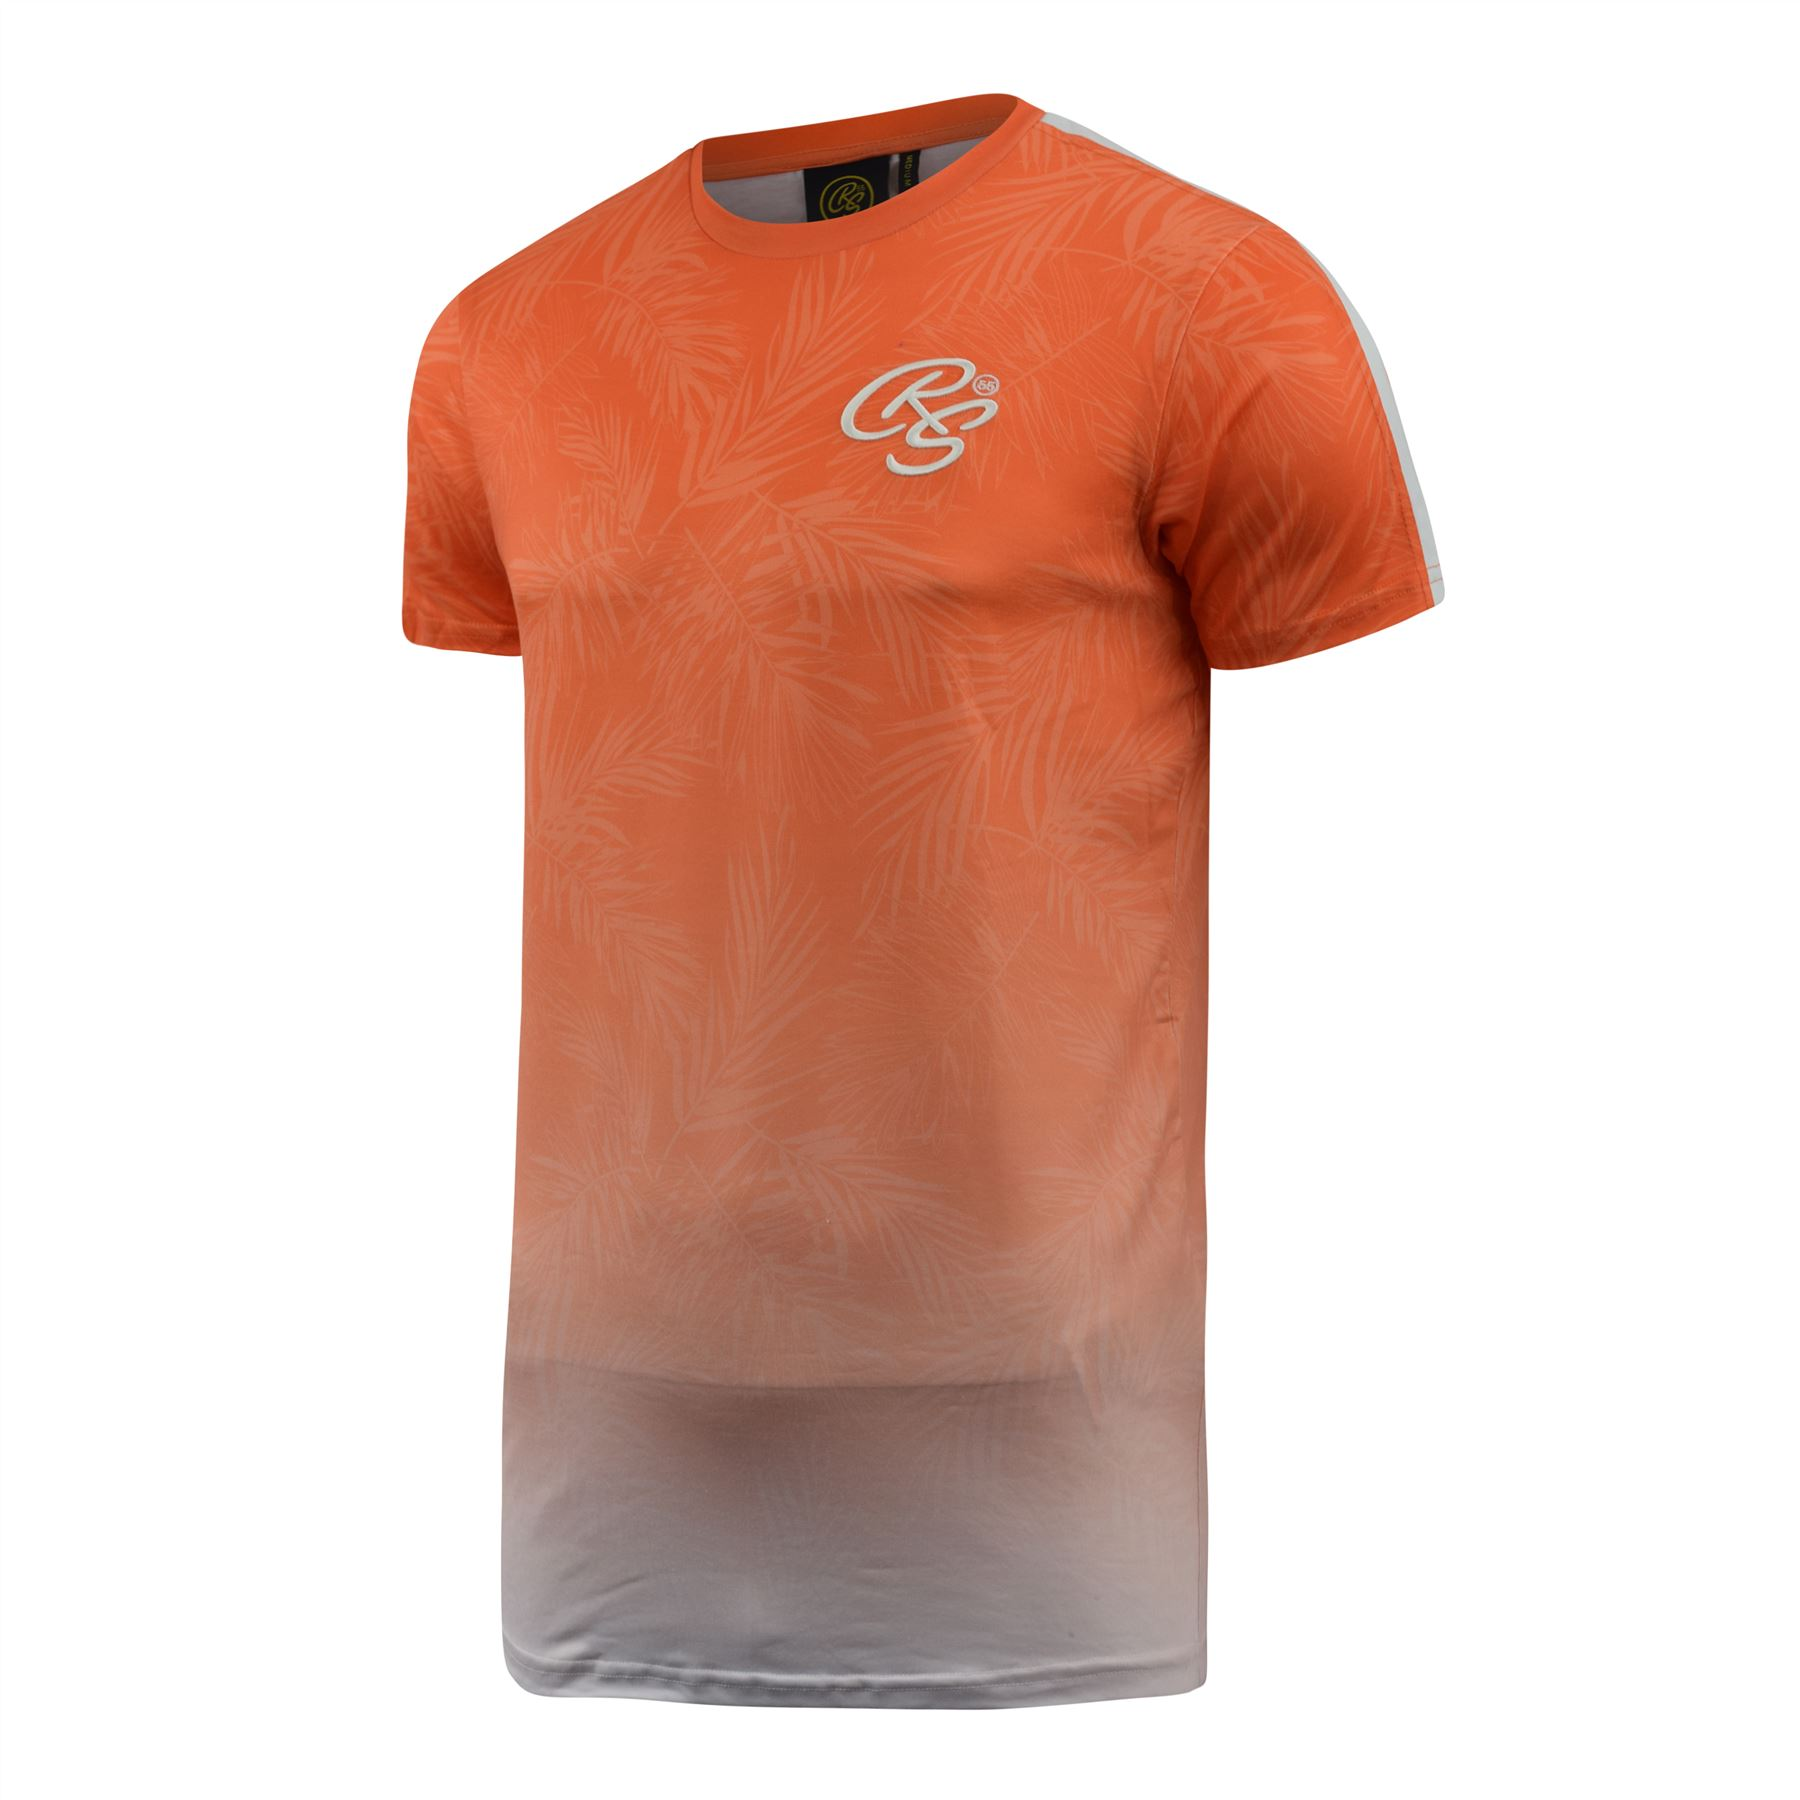 Mens-Crosshatch-T-Shirt-Contrast-Short-Sleeve-Tee-Top-Salifornia thumbnail 9